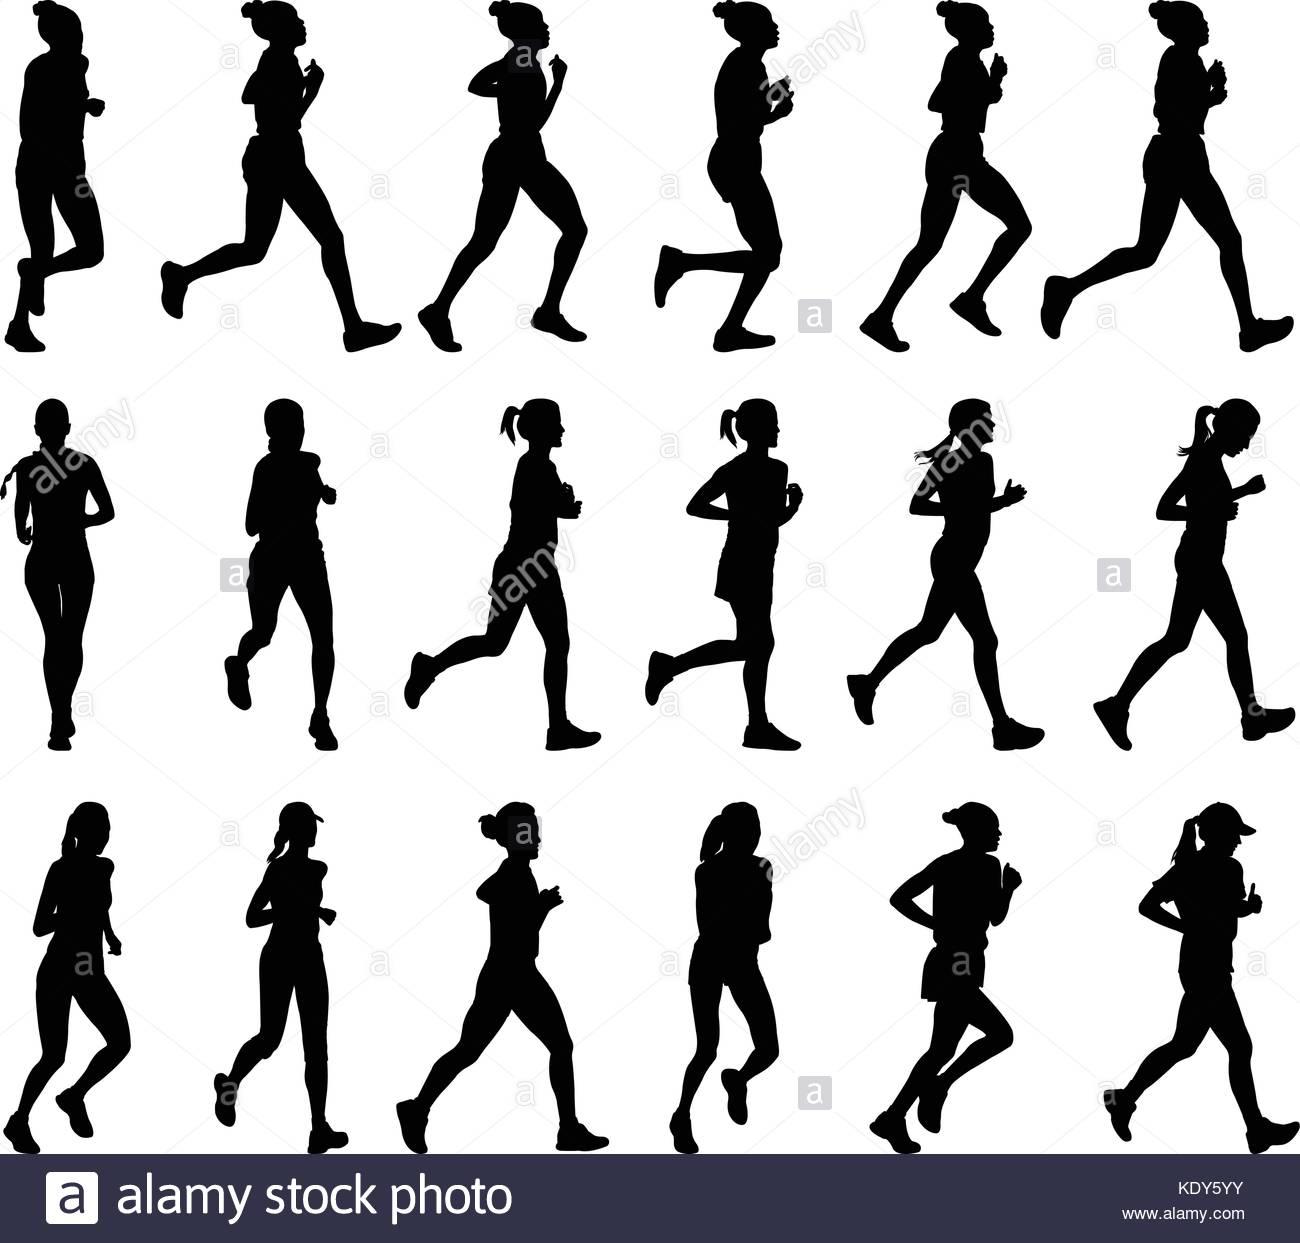 Marathon Running Silhouette